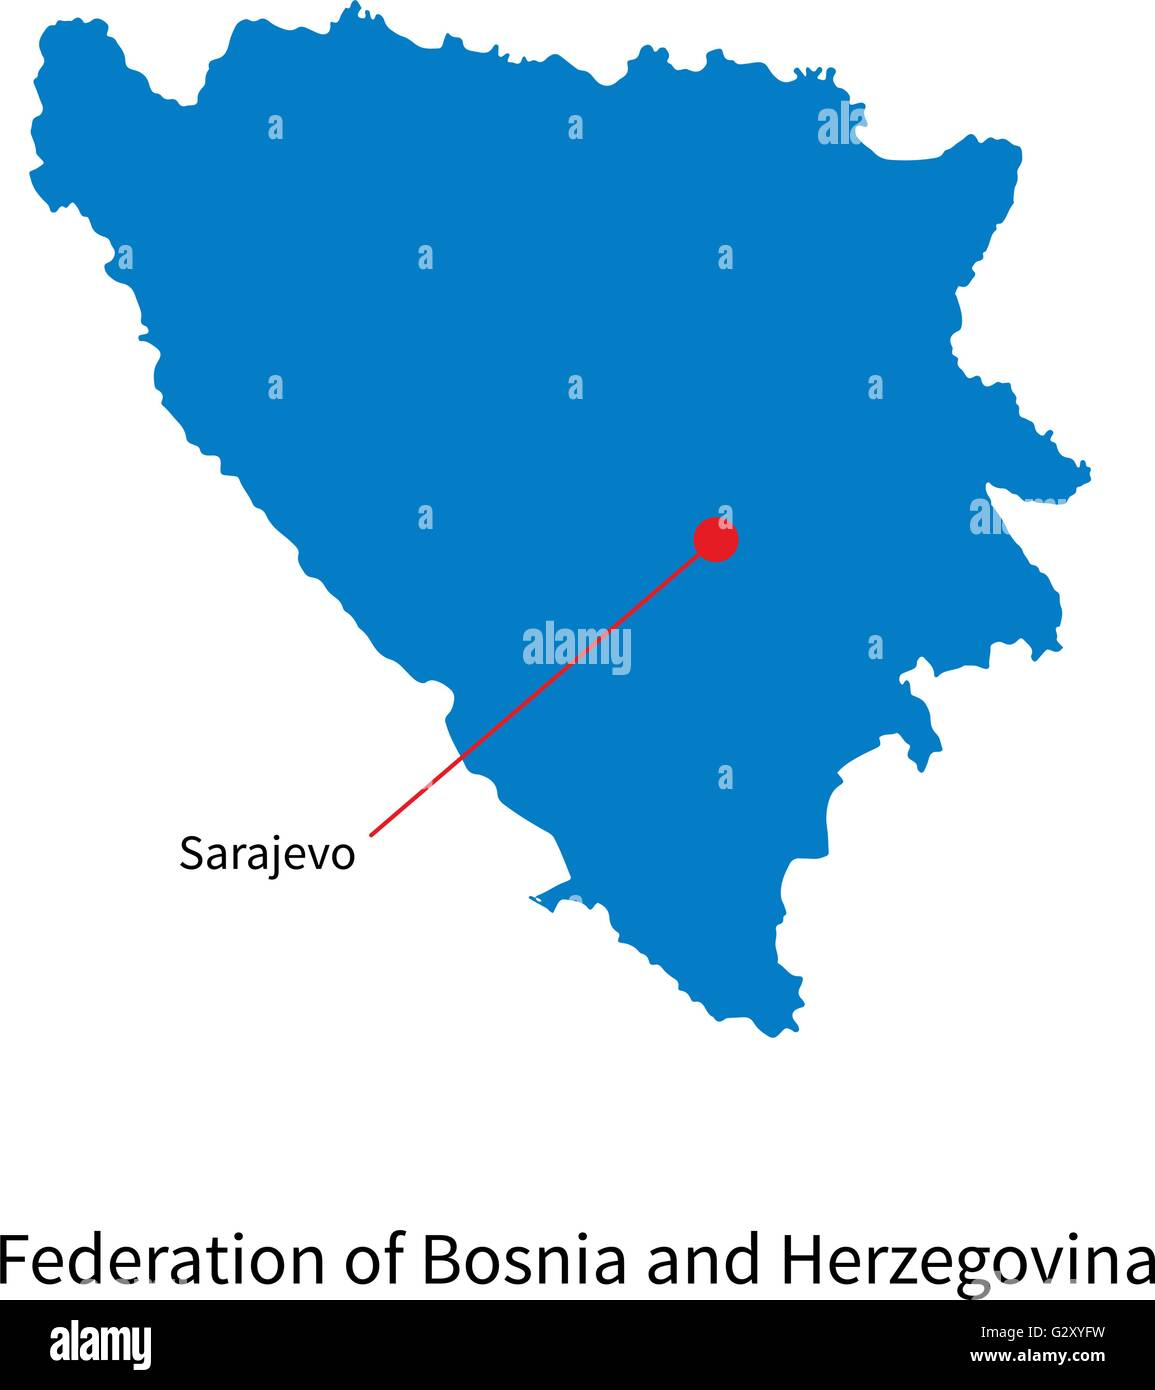 Map Federation Of Bosnia And Herzegovina With Capital City Sarajevo Stock Vector Image Art Alamy